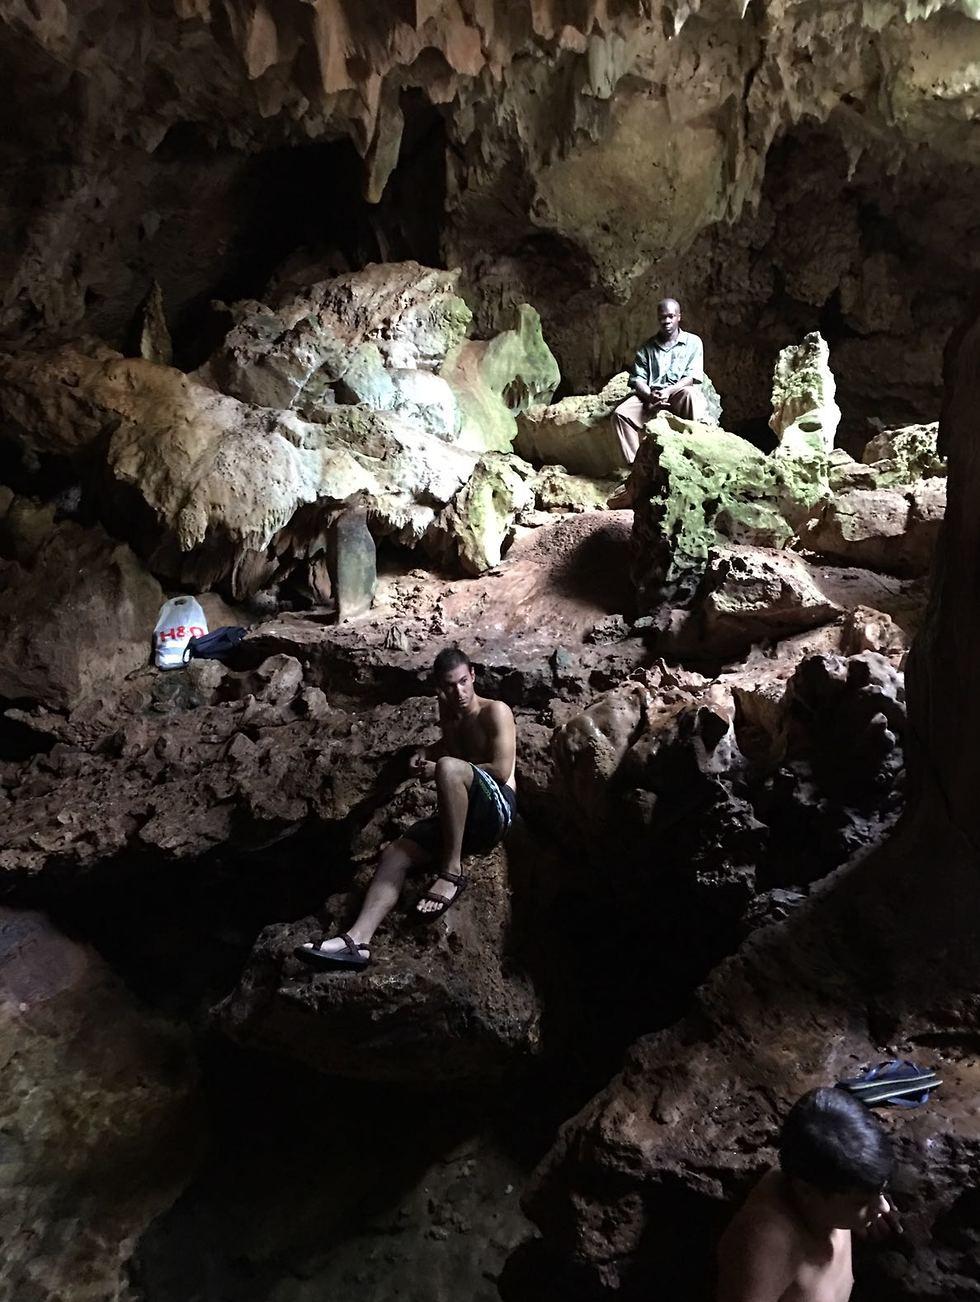 מערות פוקוצ'אני (צילום: אילן חובב)